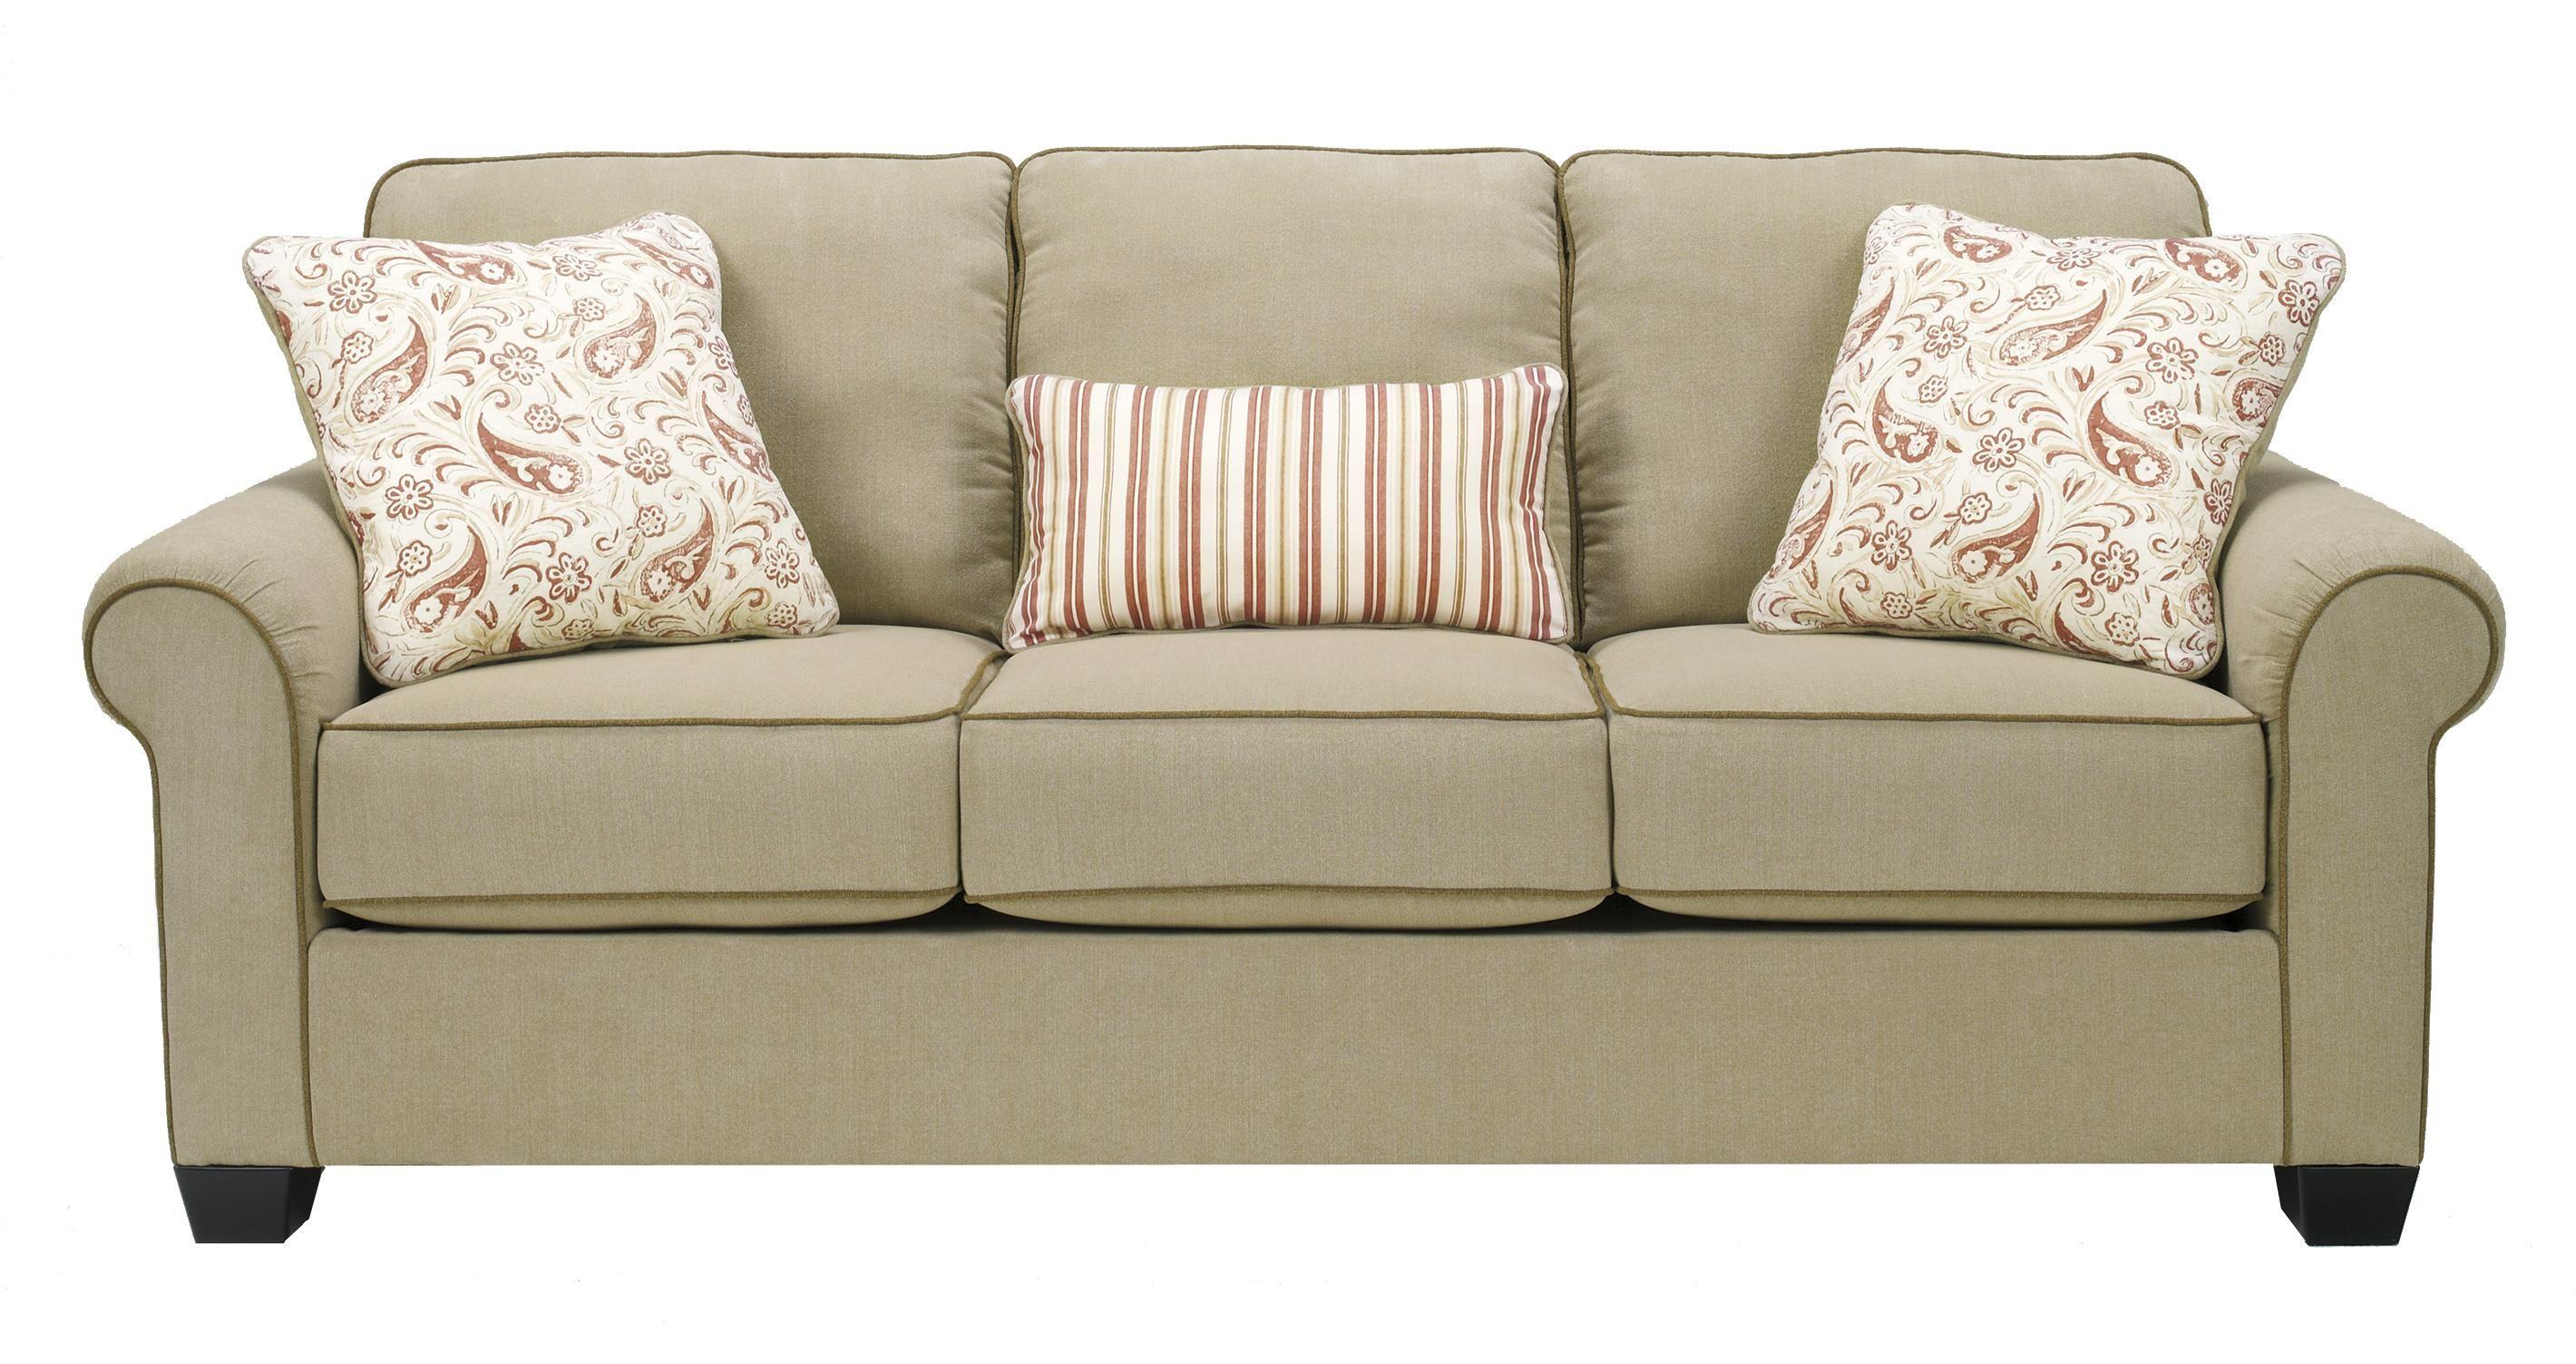 Lucretia Sand Queen Sofa Sleeper By Signature Design By Ashley Sofa Upholstery Ashley Sofa Sofa Price